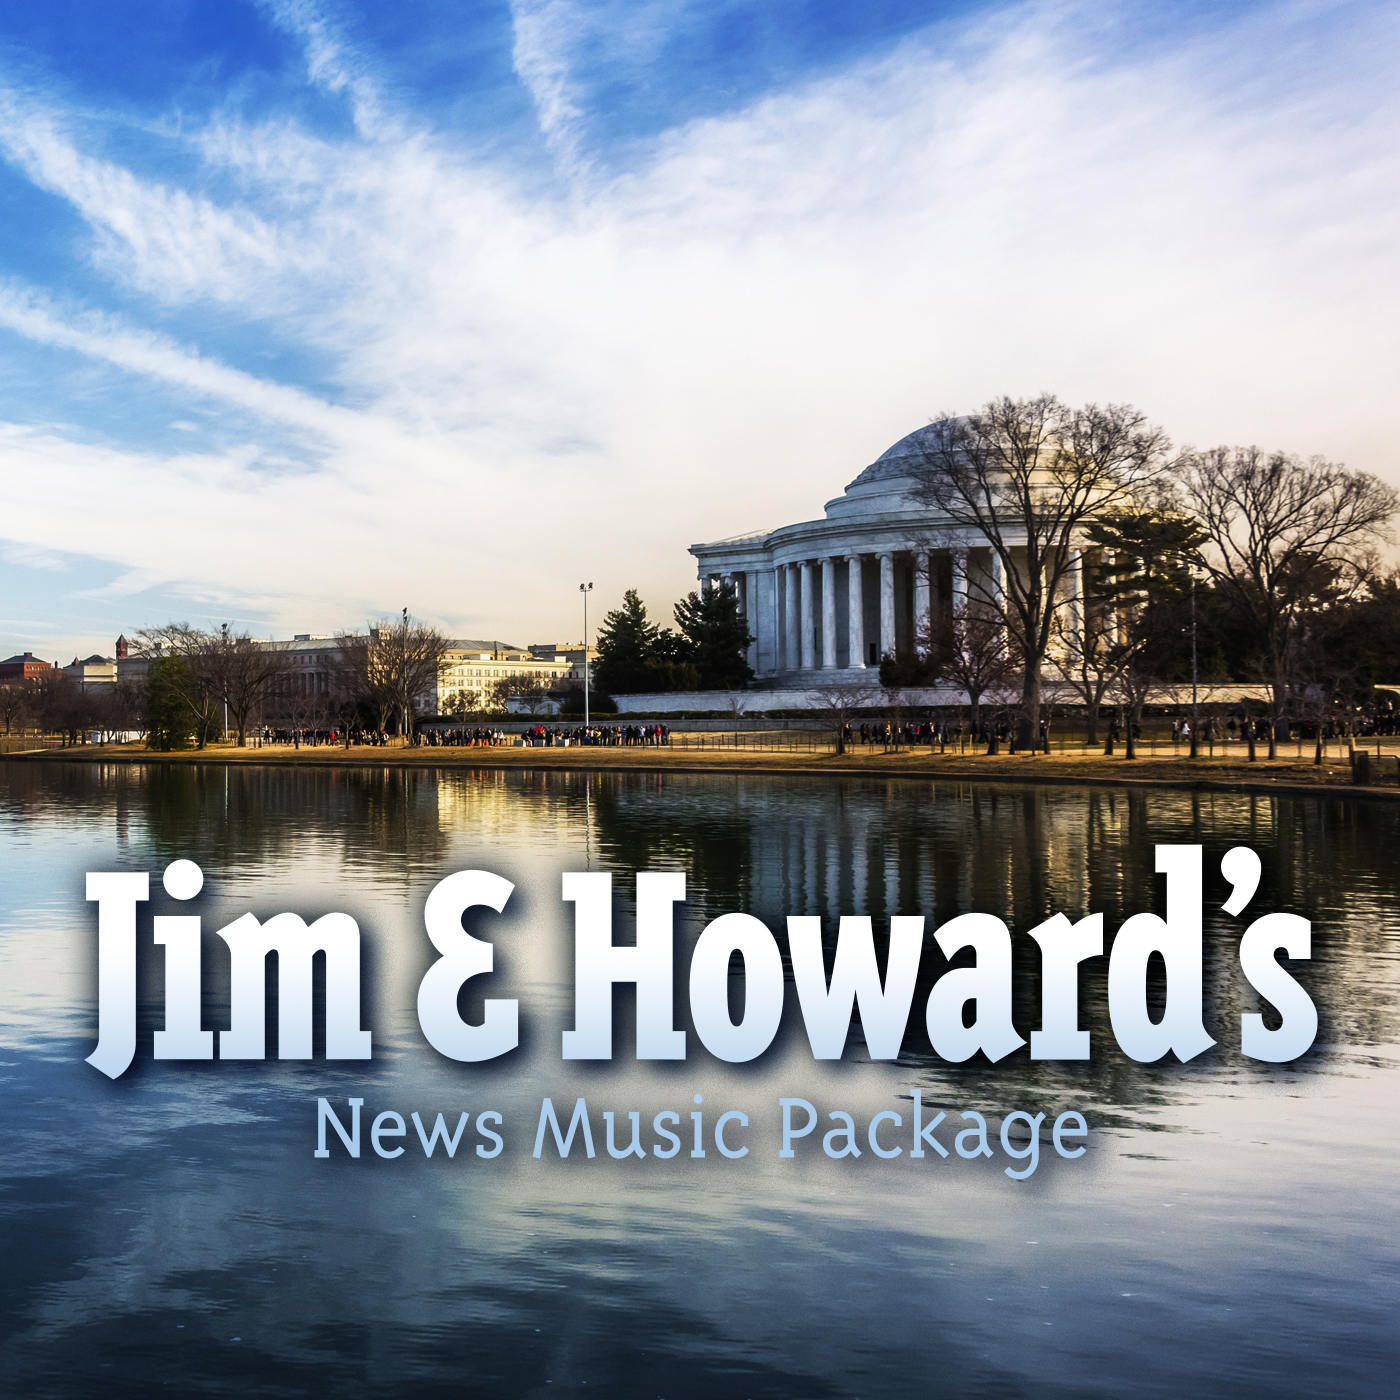 Jim & Howard's News Music Package